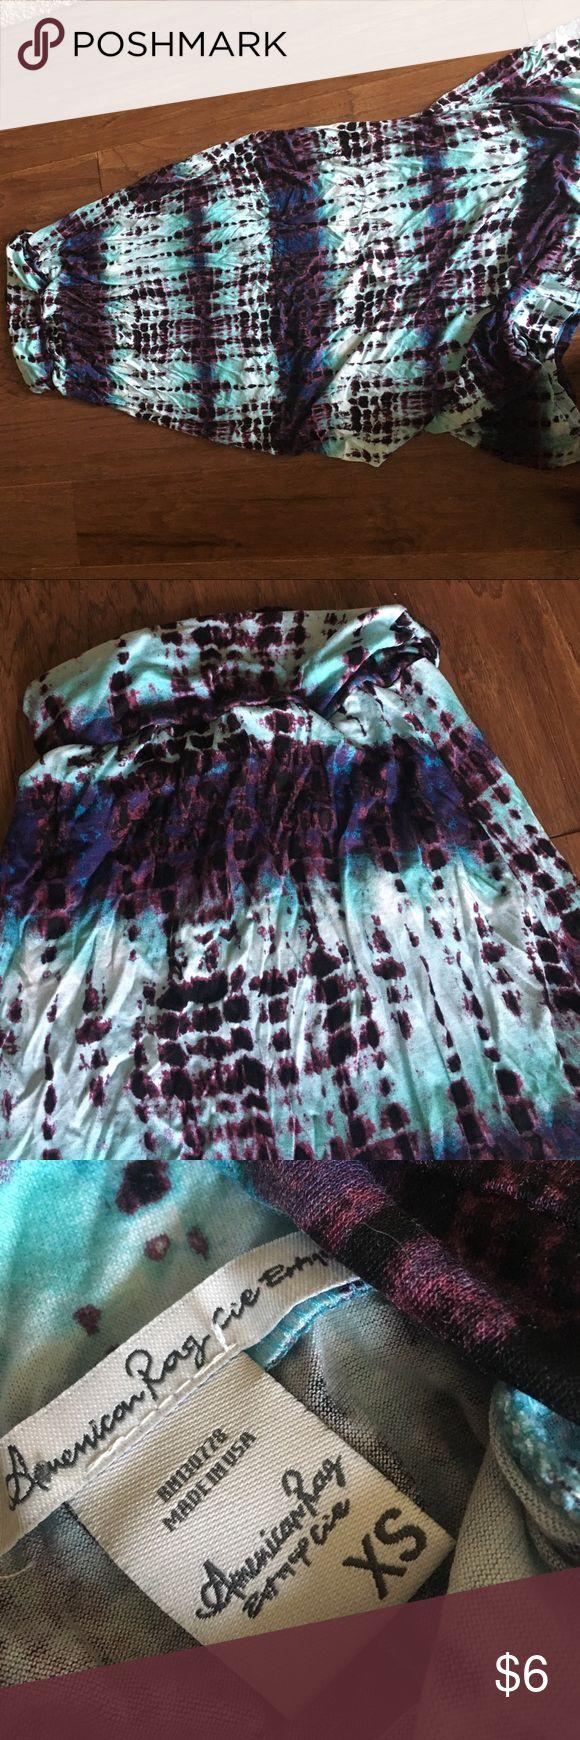 Tie dye maxi skirt size XS Super fun tie dye maxi skirt size XS. Great condition American Rag Skirts Mini